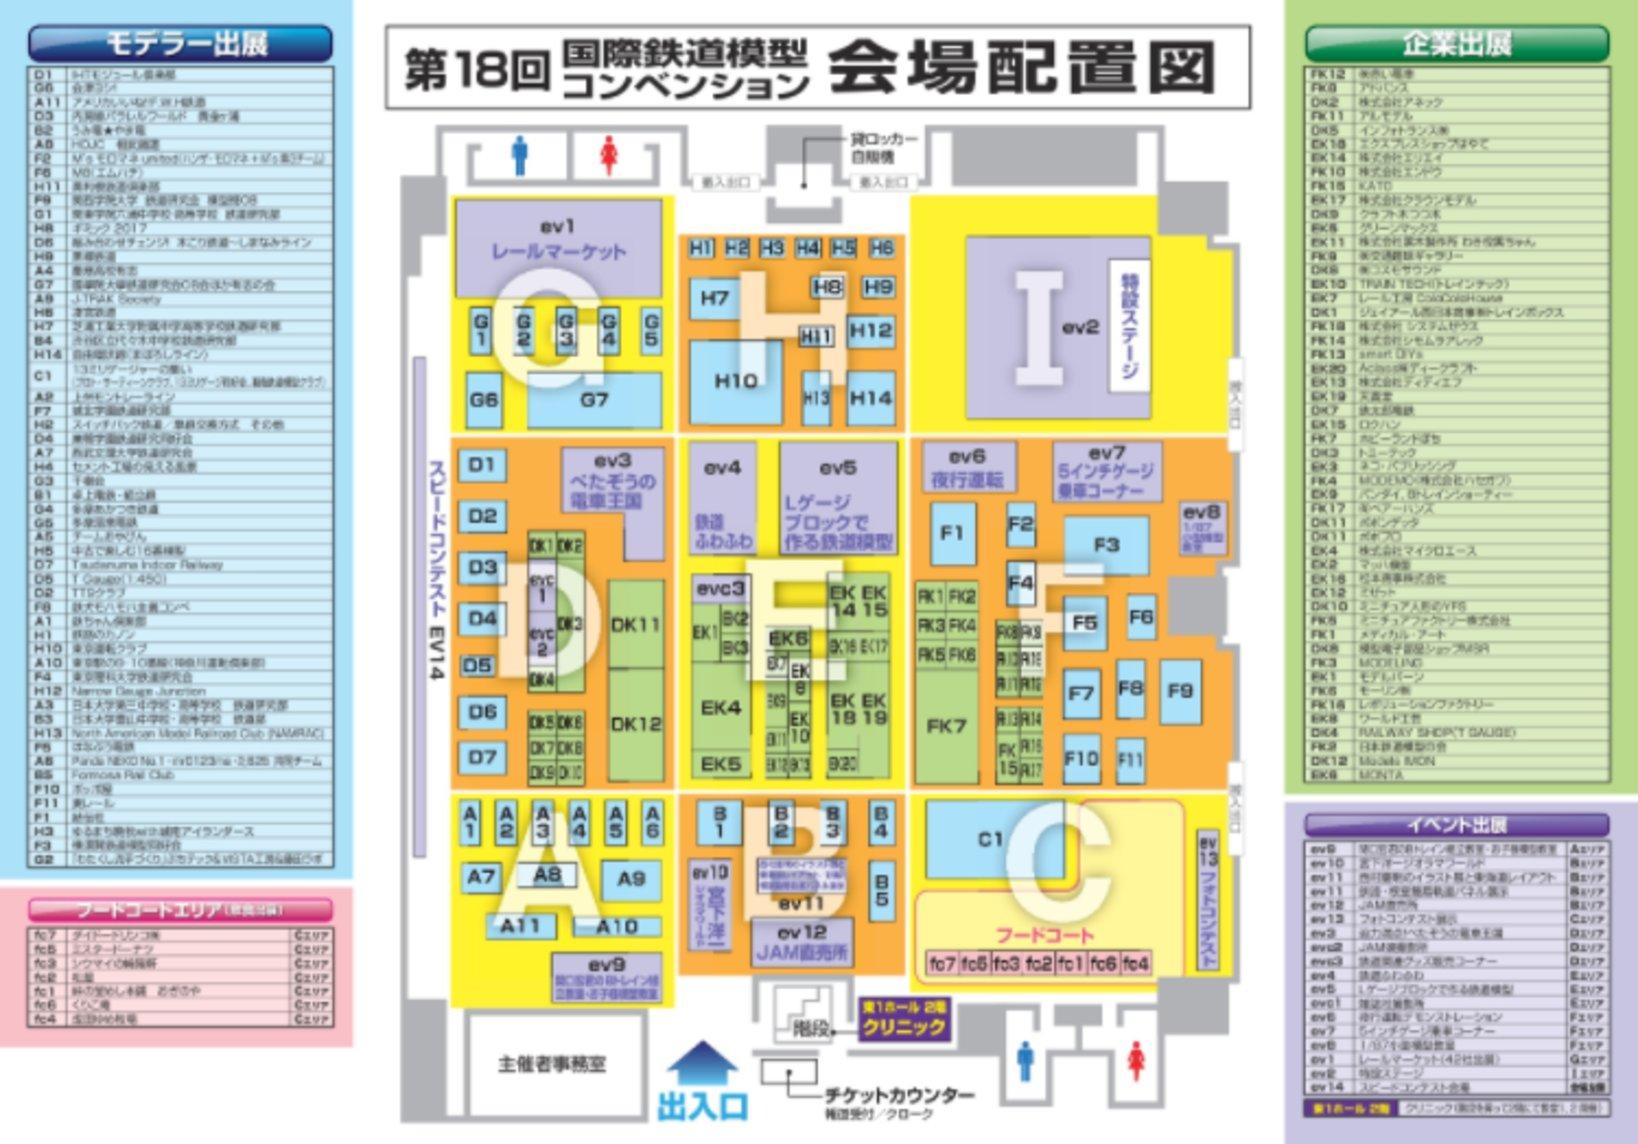 "<a href=""http://kokusaitetsudoumokei-convention.jp/wp/wp-content/uploads/2017/01/3ba081a7f7fb1c36136e416b37004bba.jpg"">会場の詳細が見たいかたはこちらをクリック</a>"